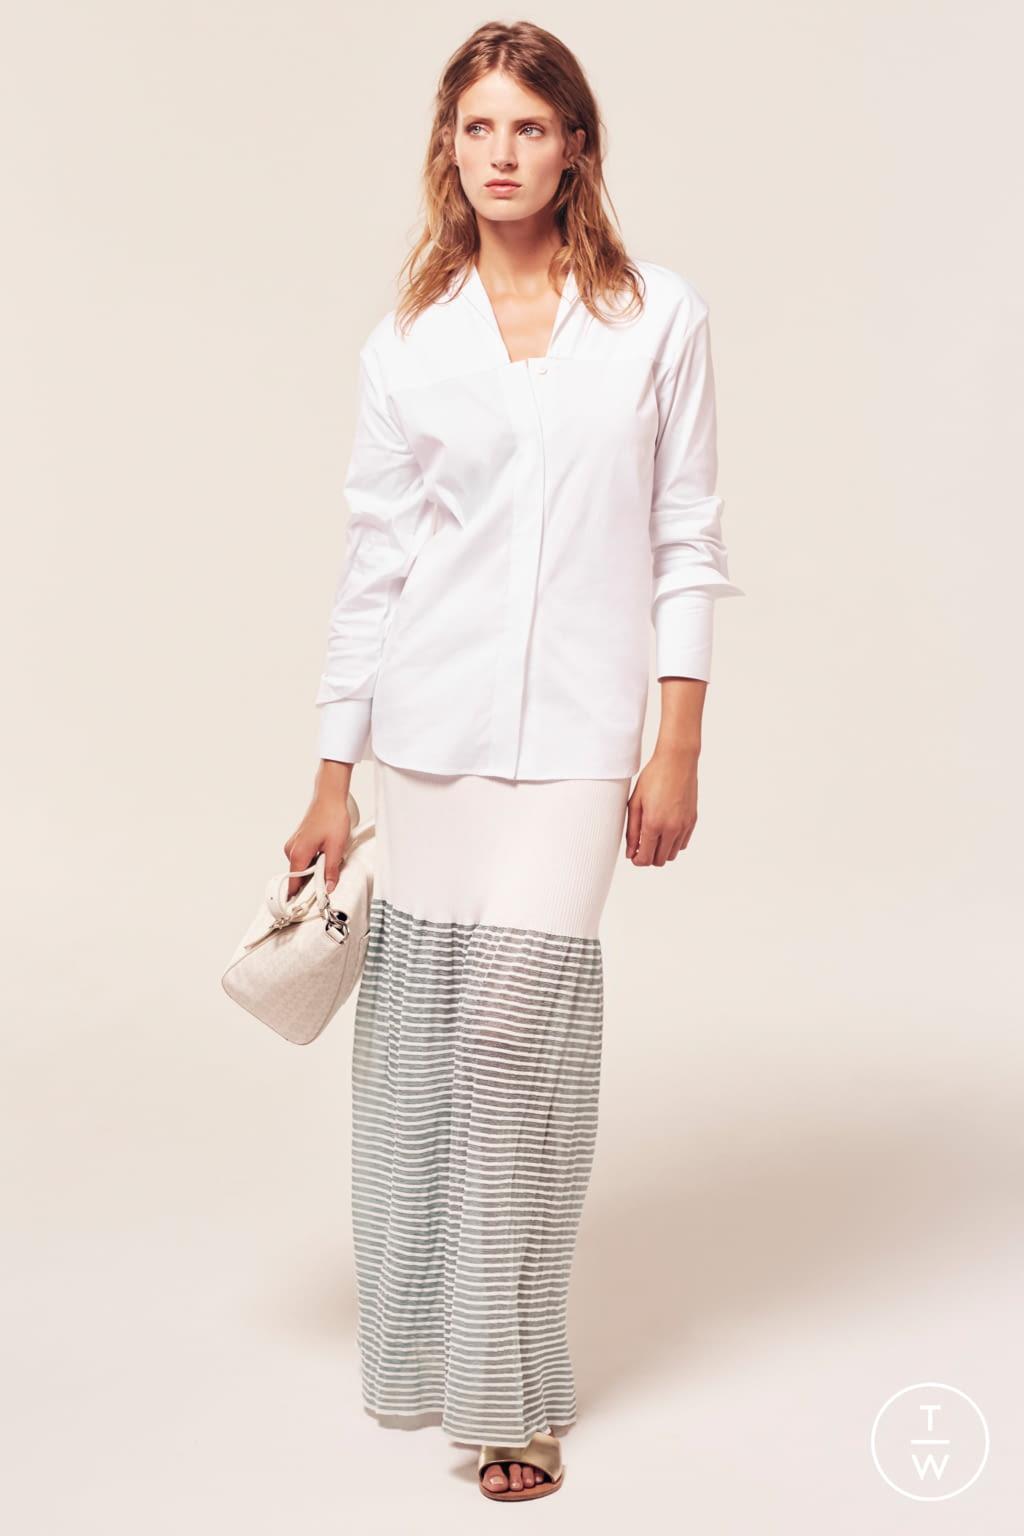 Fashion Week Paris Spring/Summer 2018 look 30 de la collection Maison Ullens womenswear